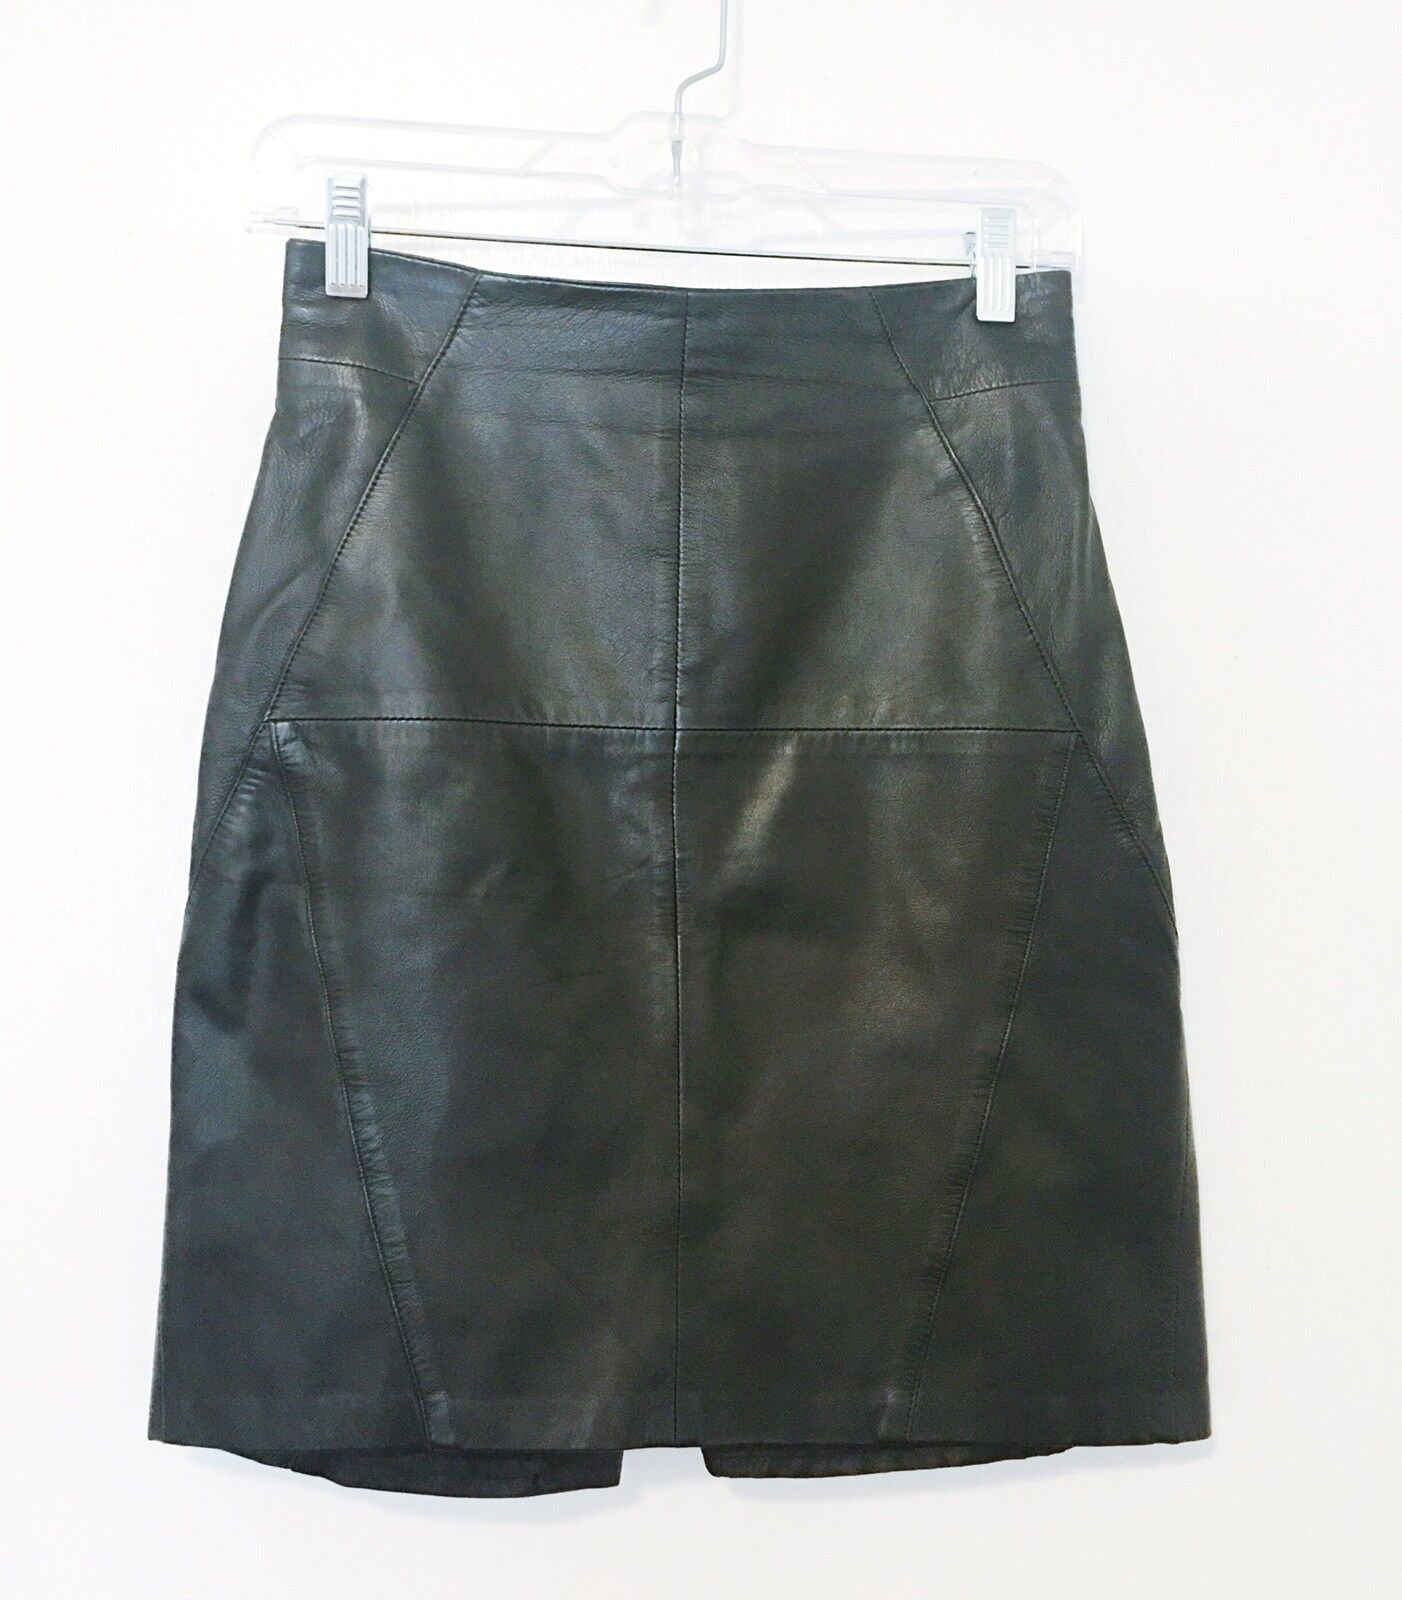 H&M Genuine Leather Knee Length Skirt Größe 6